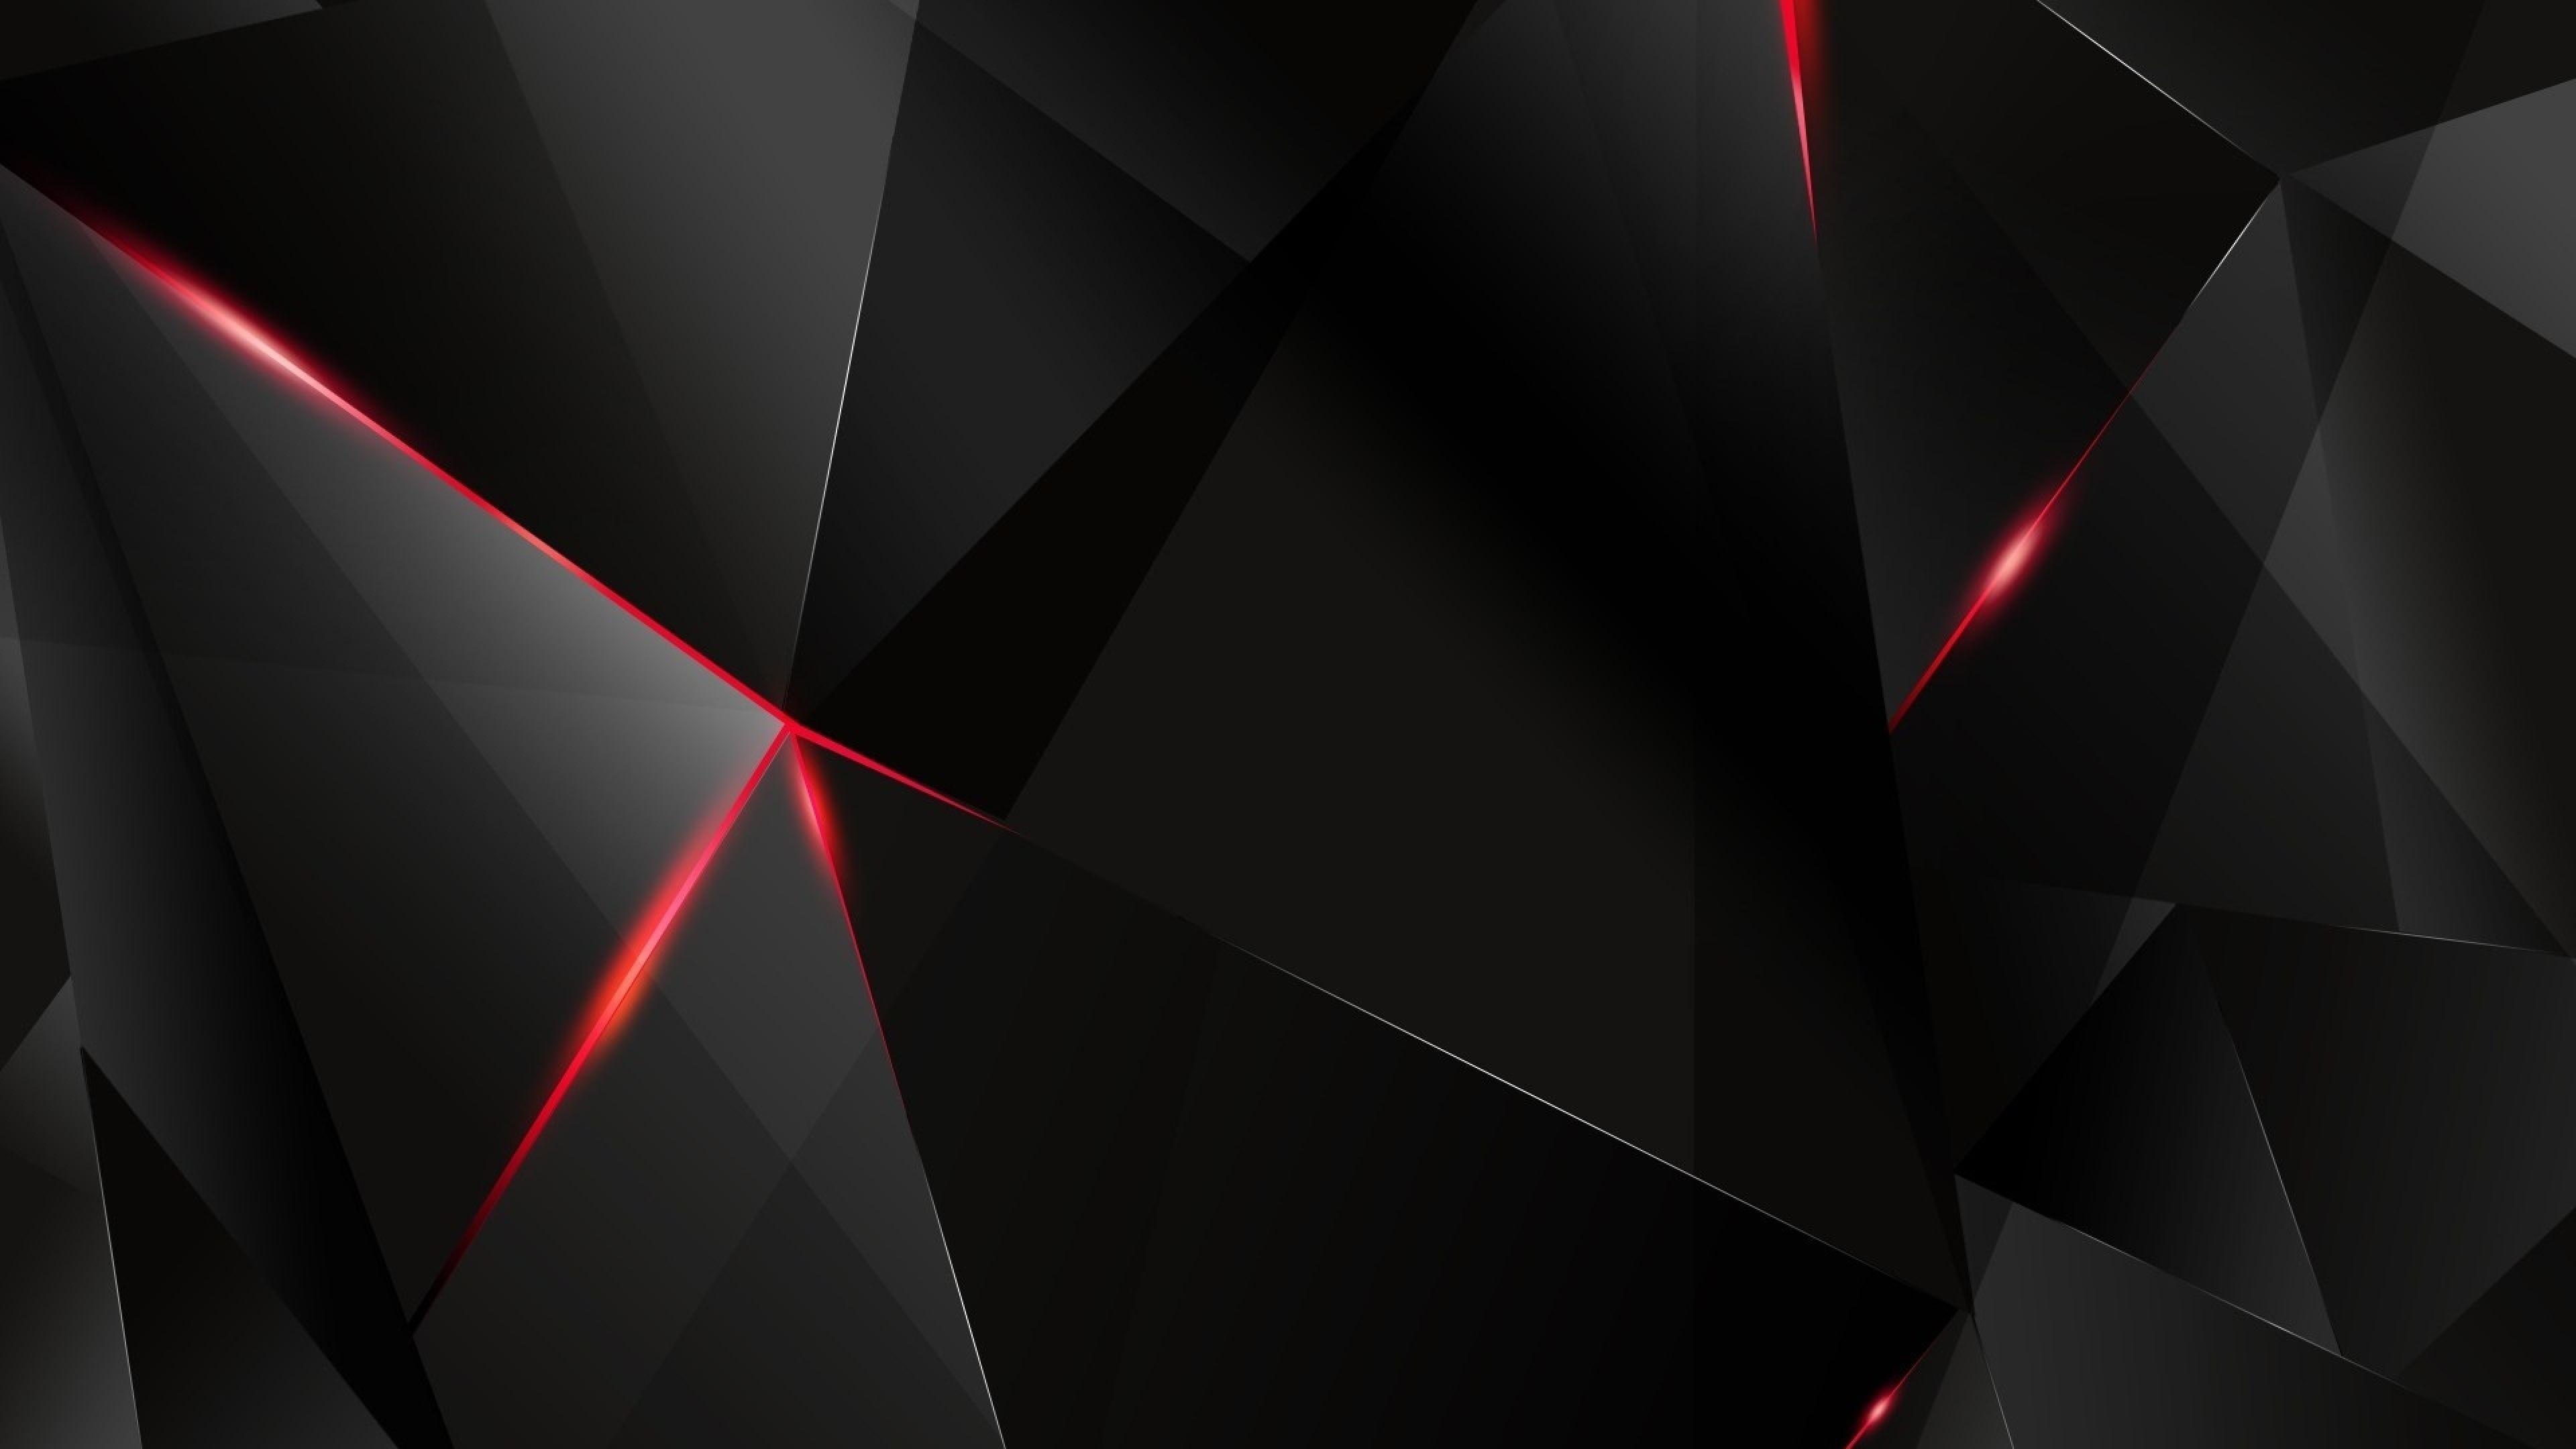 Download Wallpaper 3840x2160 Black, Light, Dark, Figures 4K Ultra ... | vv in 2019 | Black ...